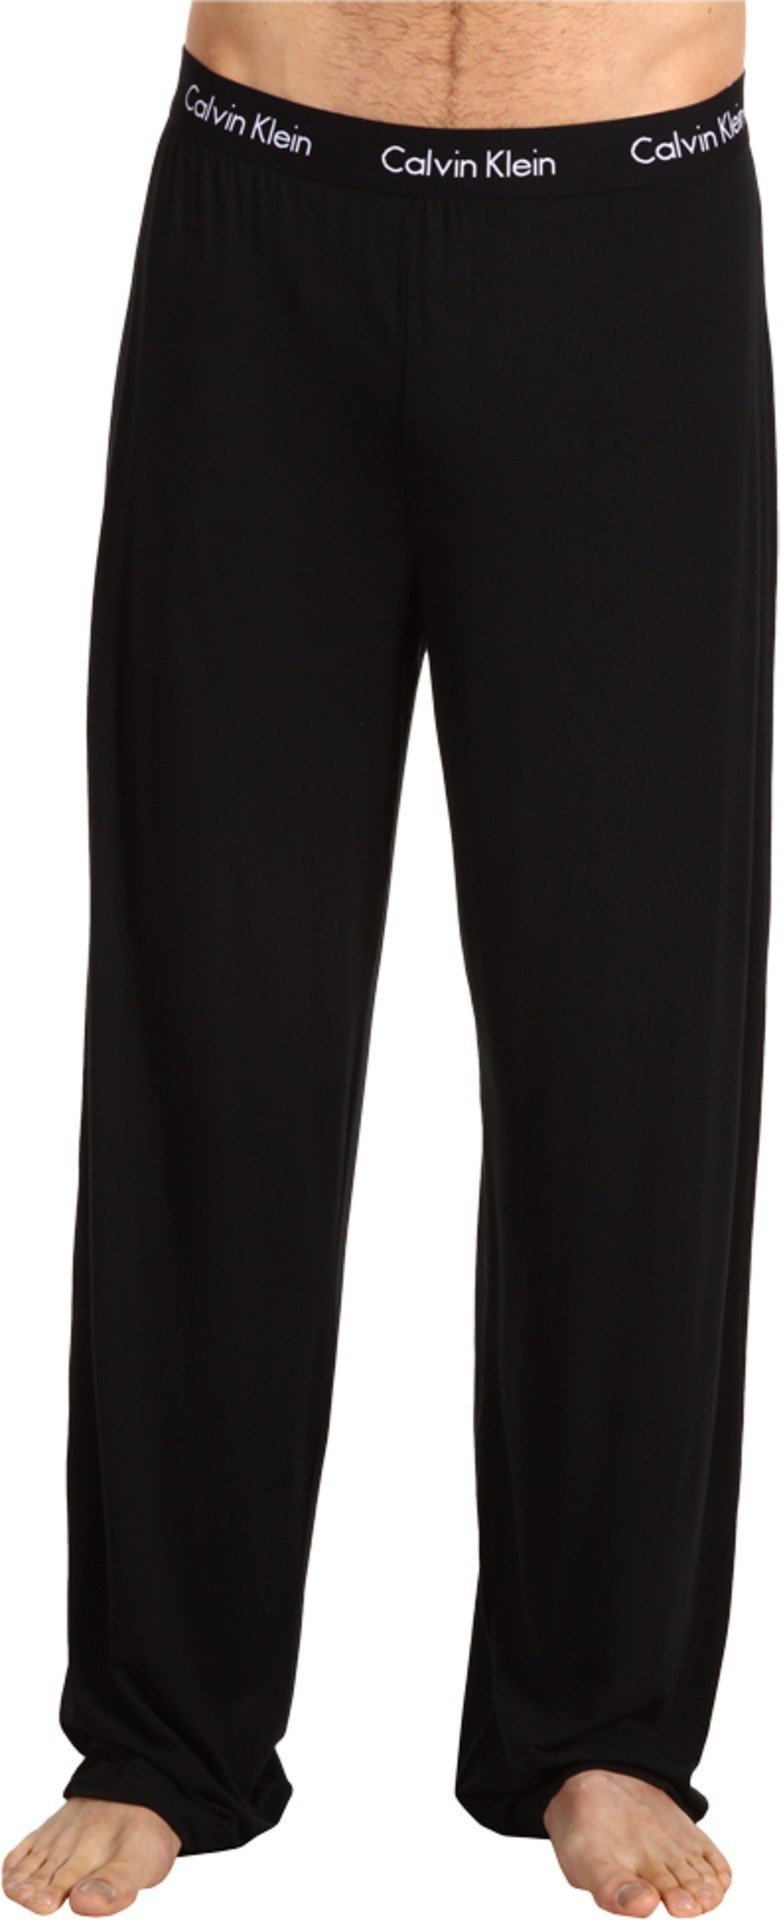 Calvin Klein Men's Body Modal Sleep Pant,Black,Large